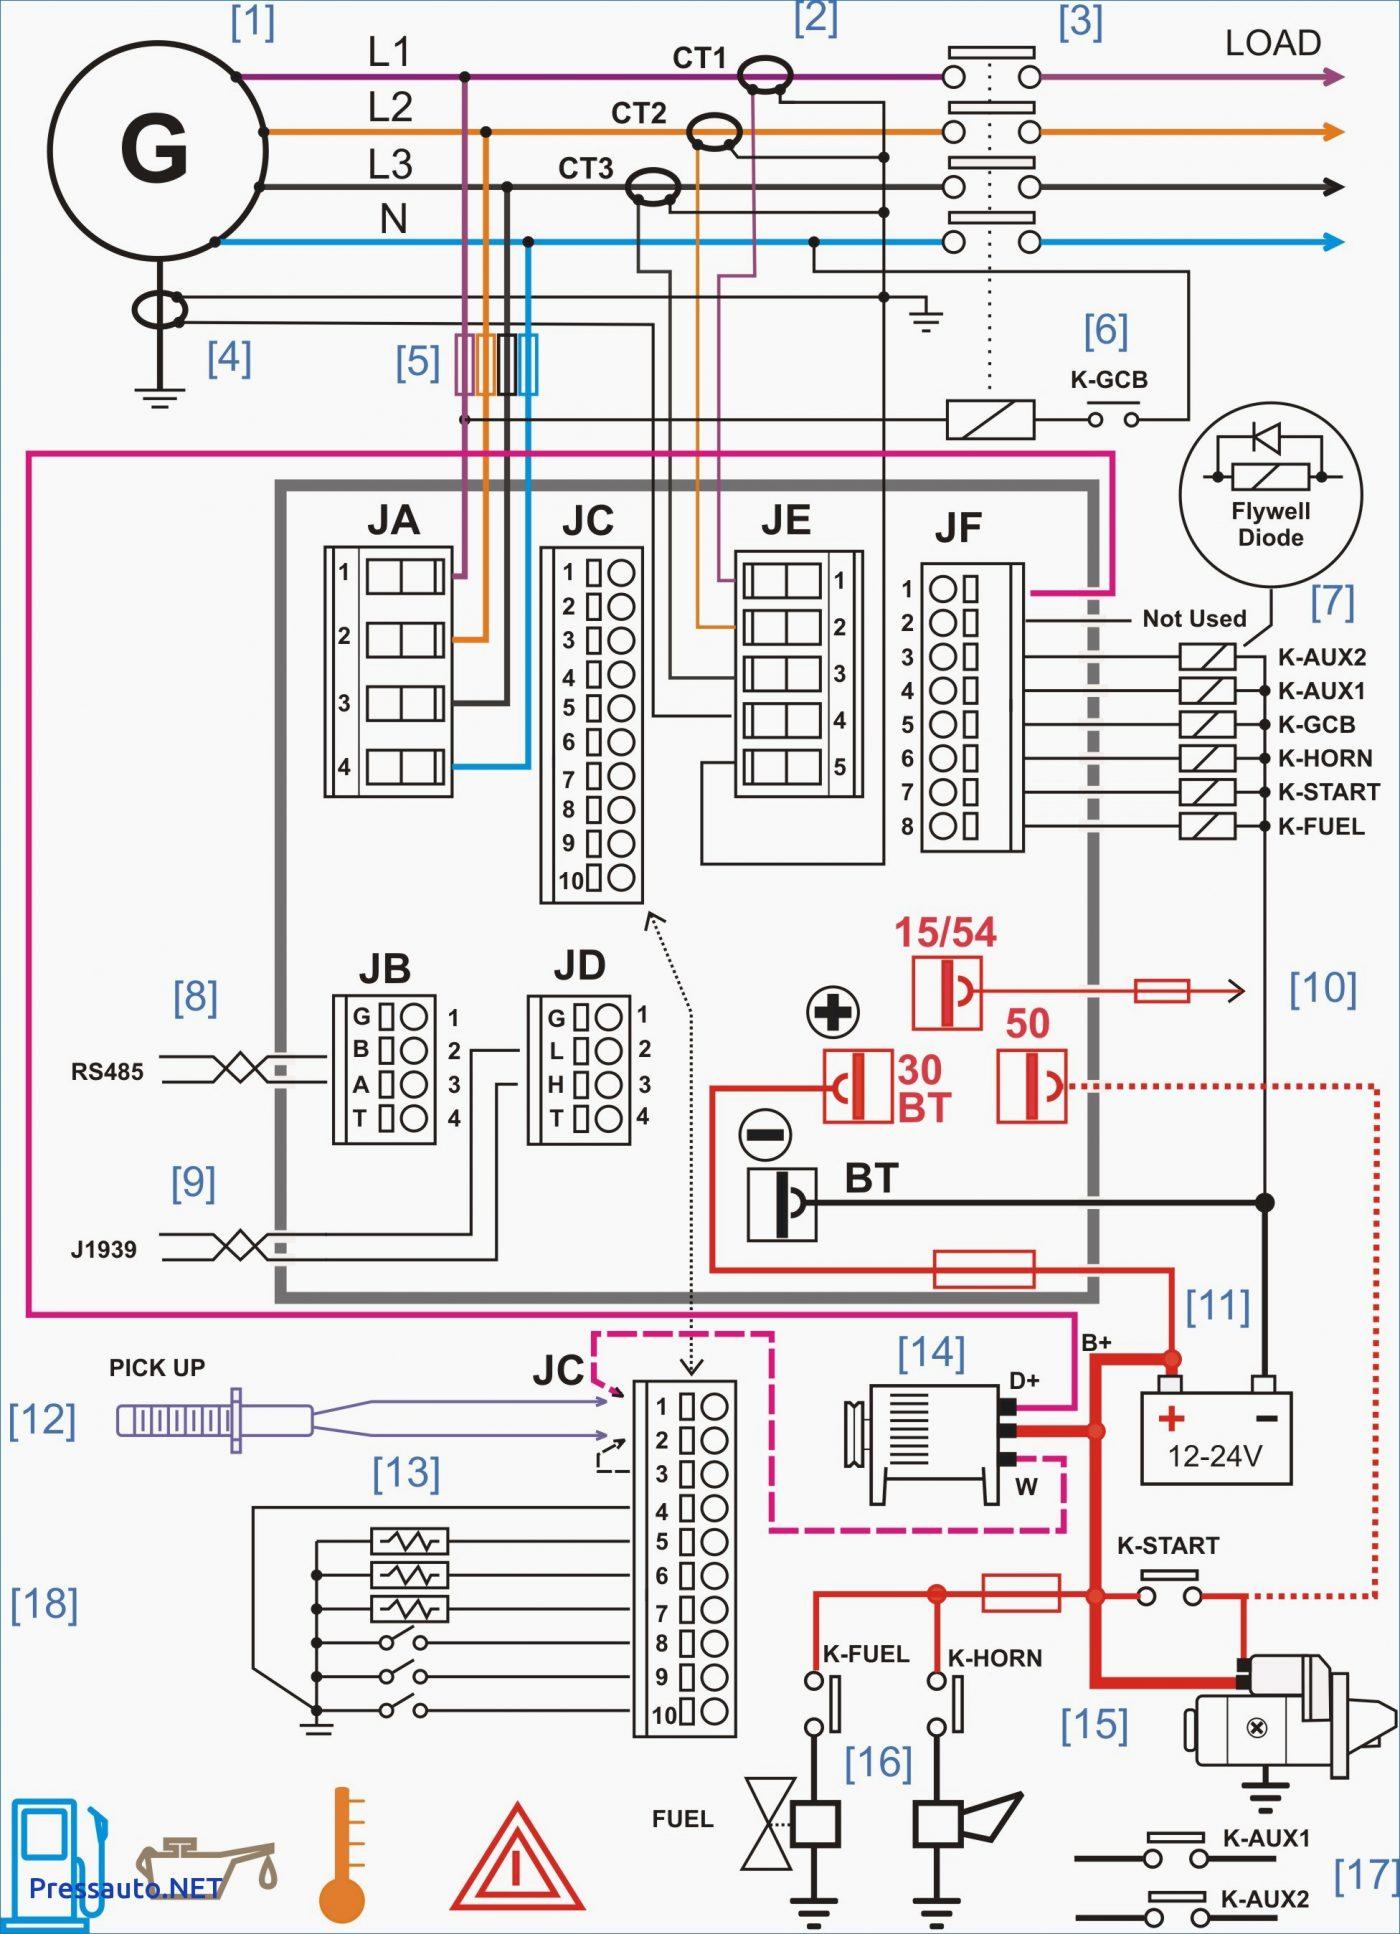 Tata Super Ace Wiring Diagram Pdf Best Wiring Diagrams